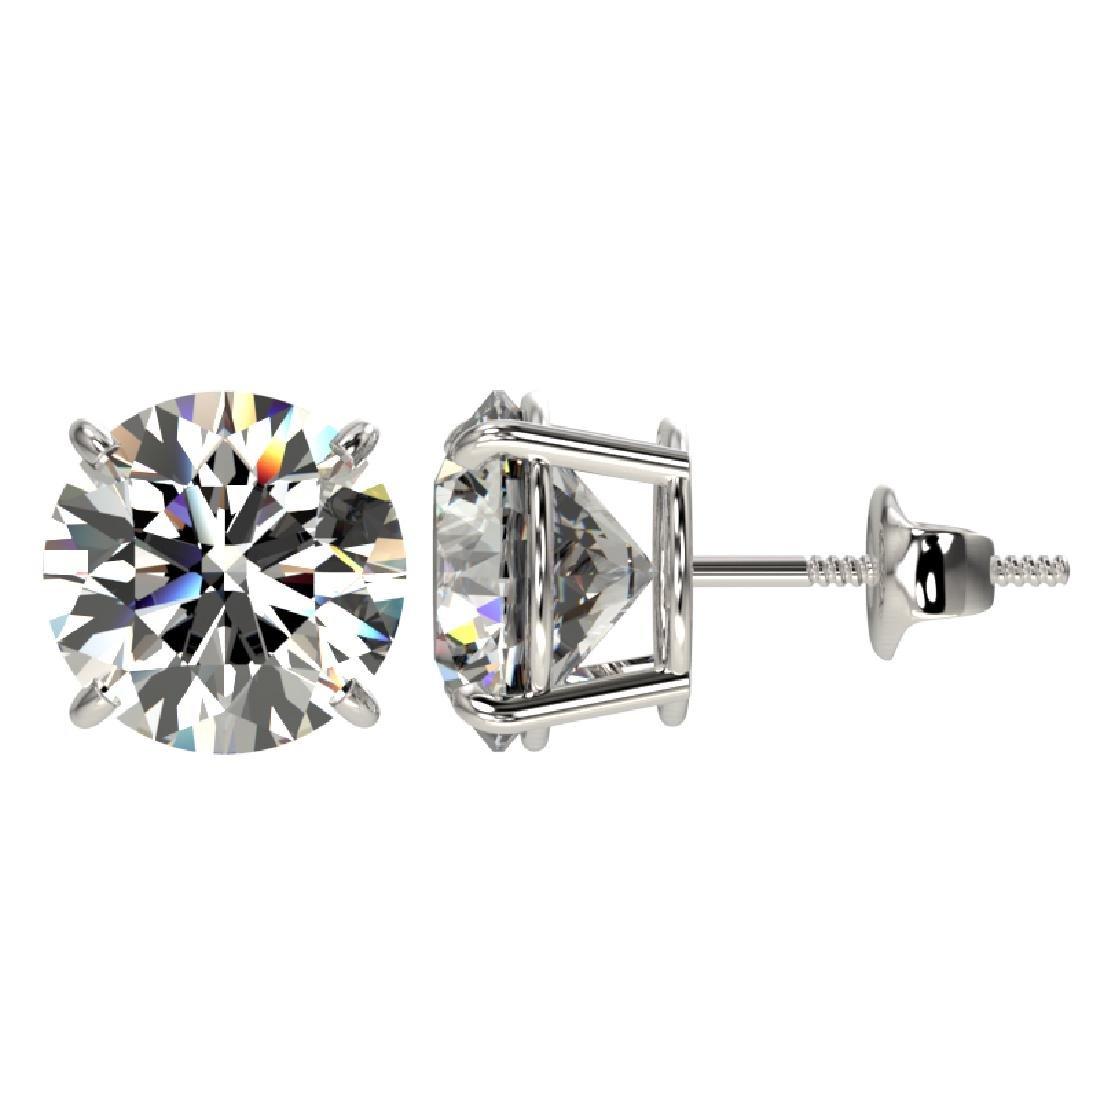 4.04 CTW Certified G-Si Quality Diamond Stud Earrings - 2